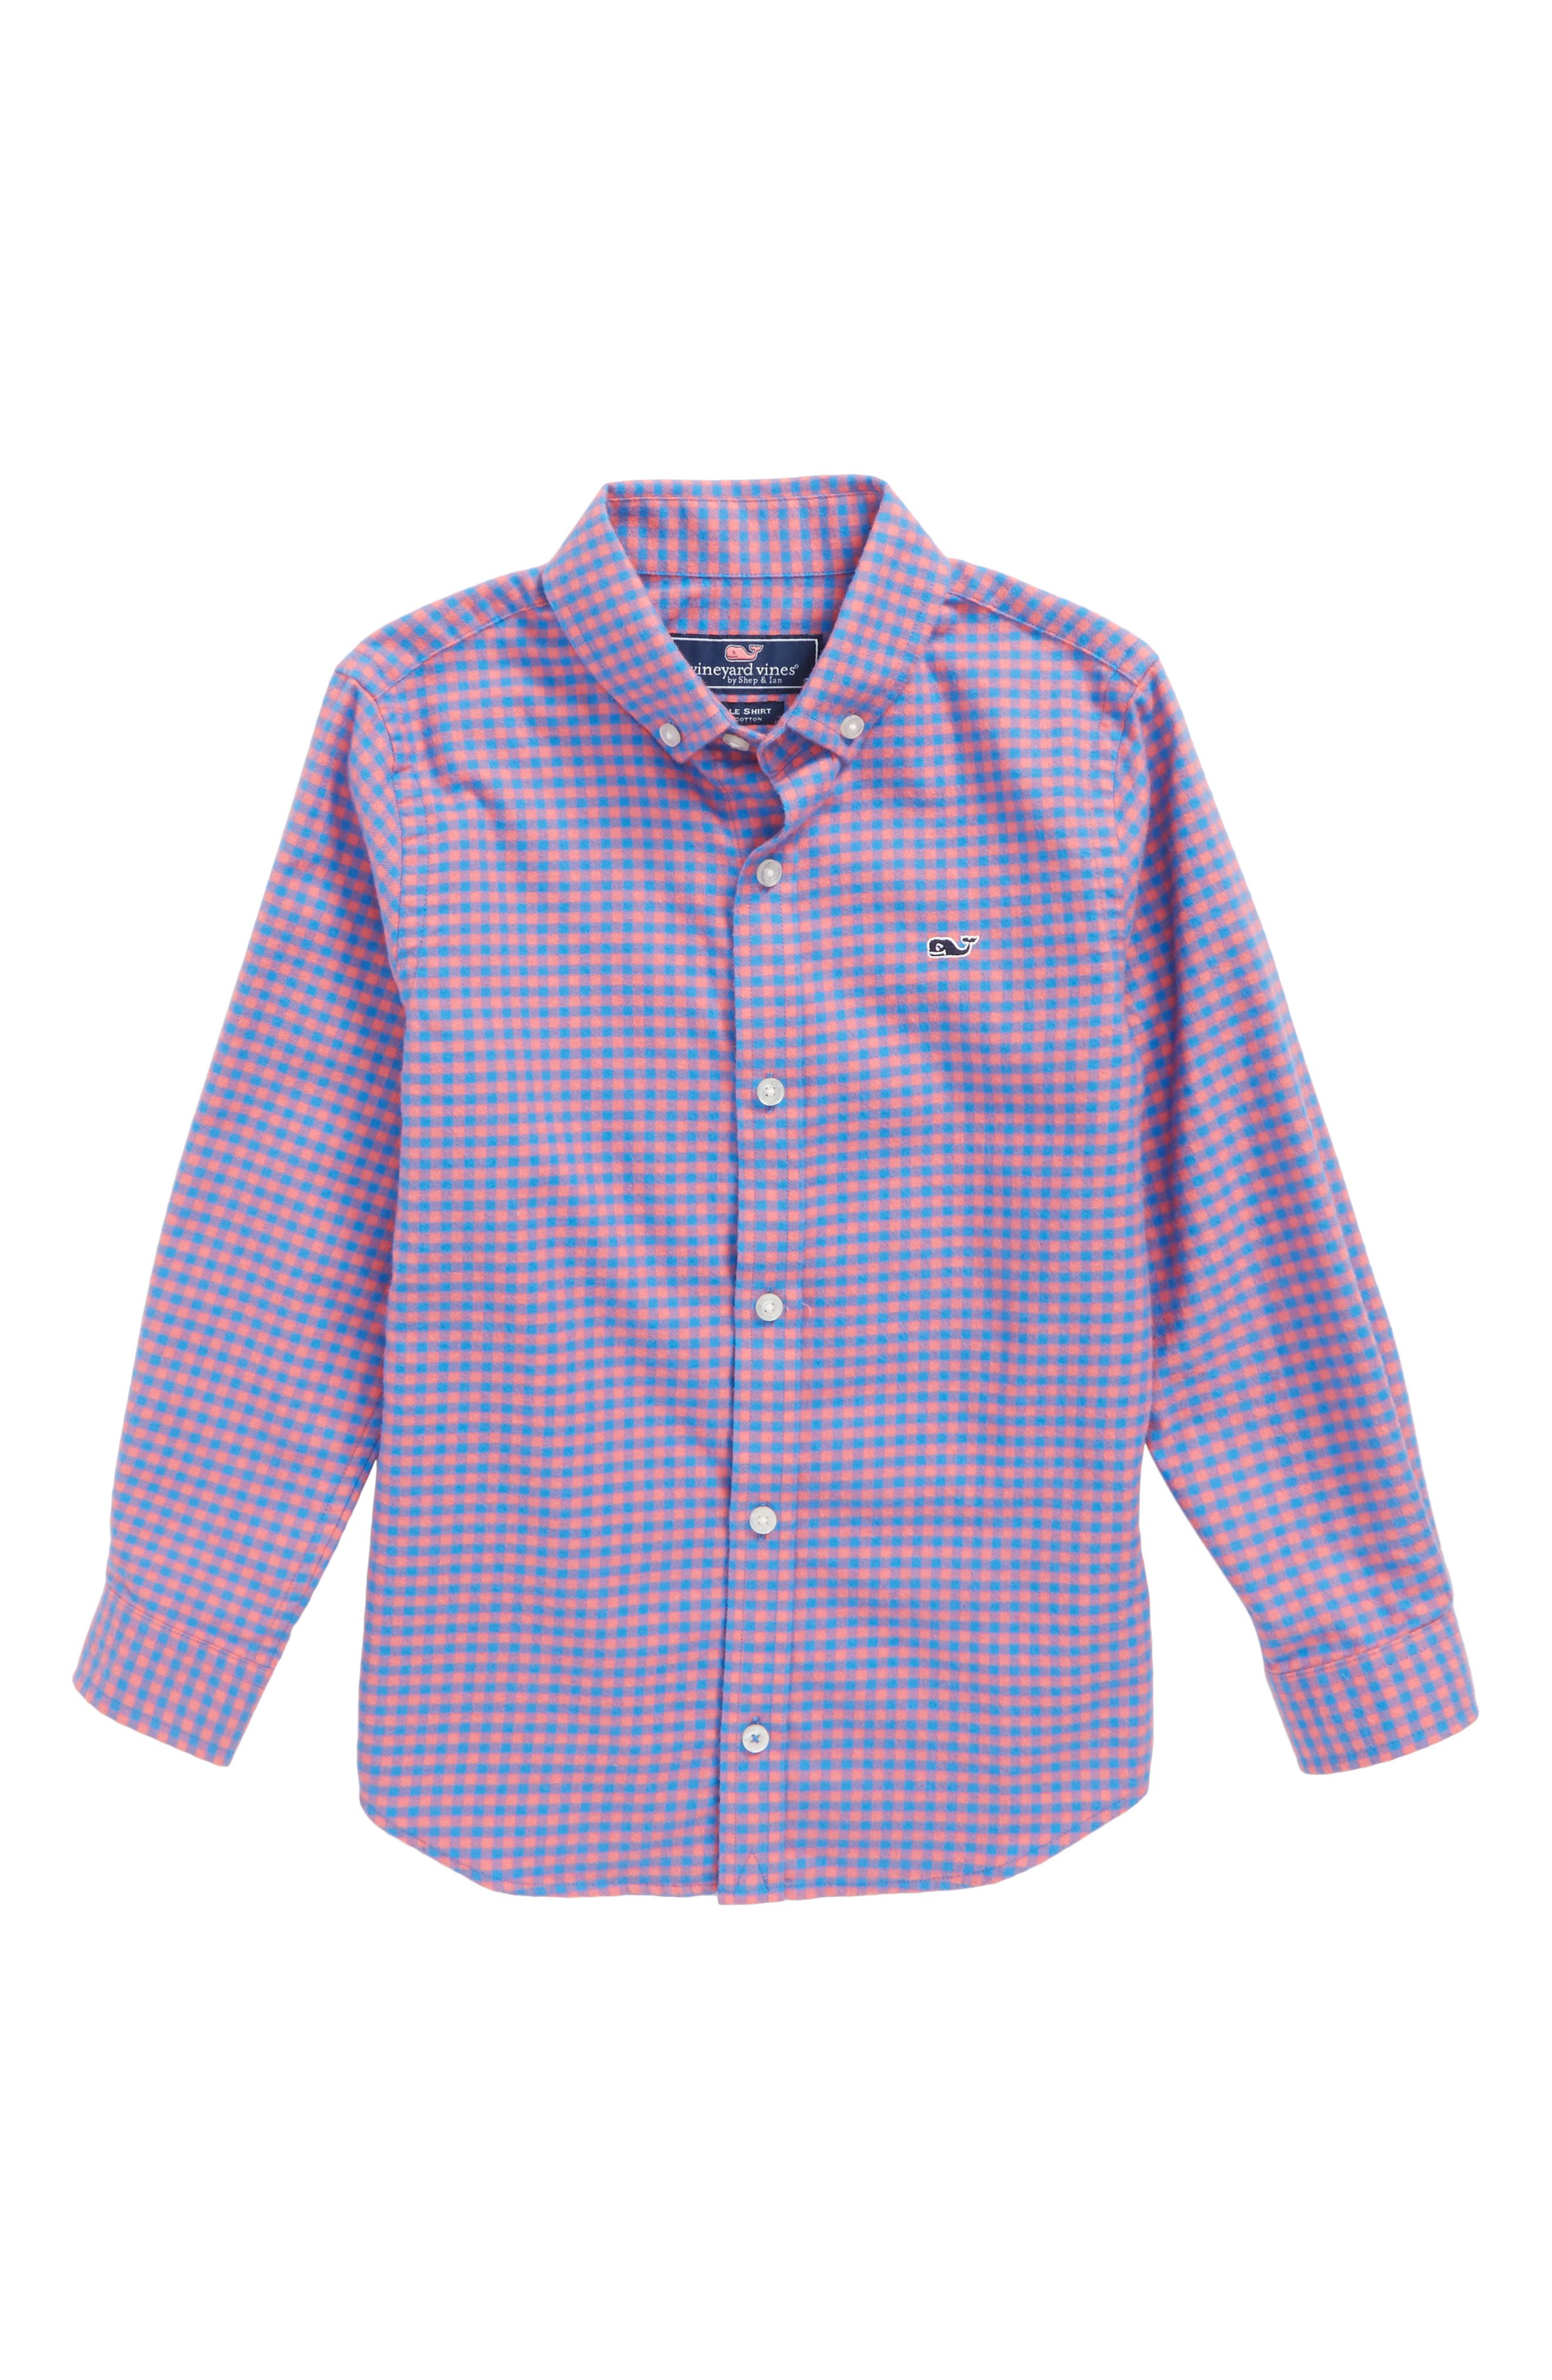 vineyard vines Sandy Point Plaid Whale Flannel Shirt (Toddler Boys, Little Boys & Big Boys)